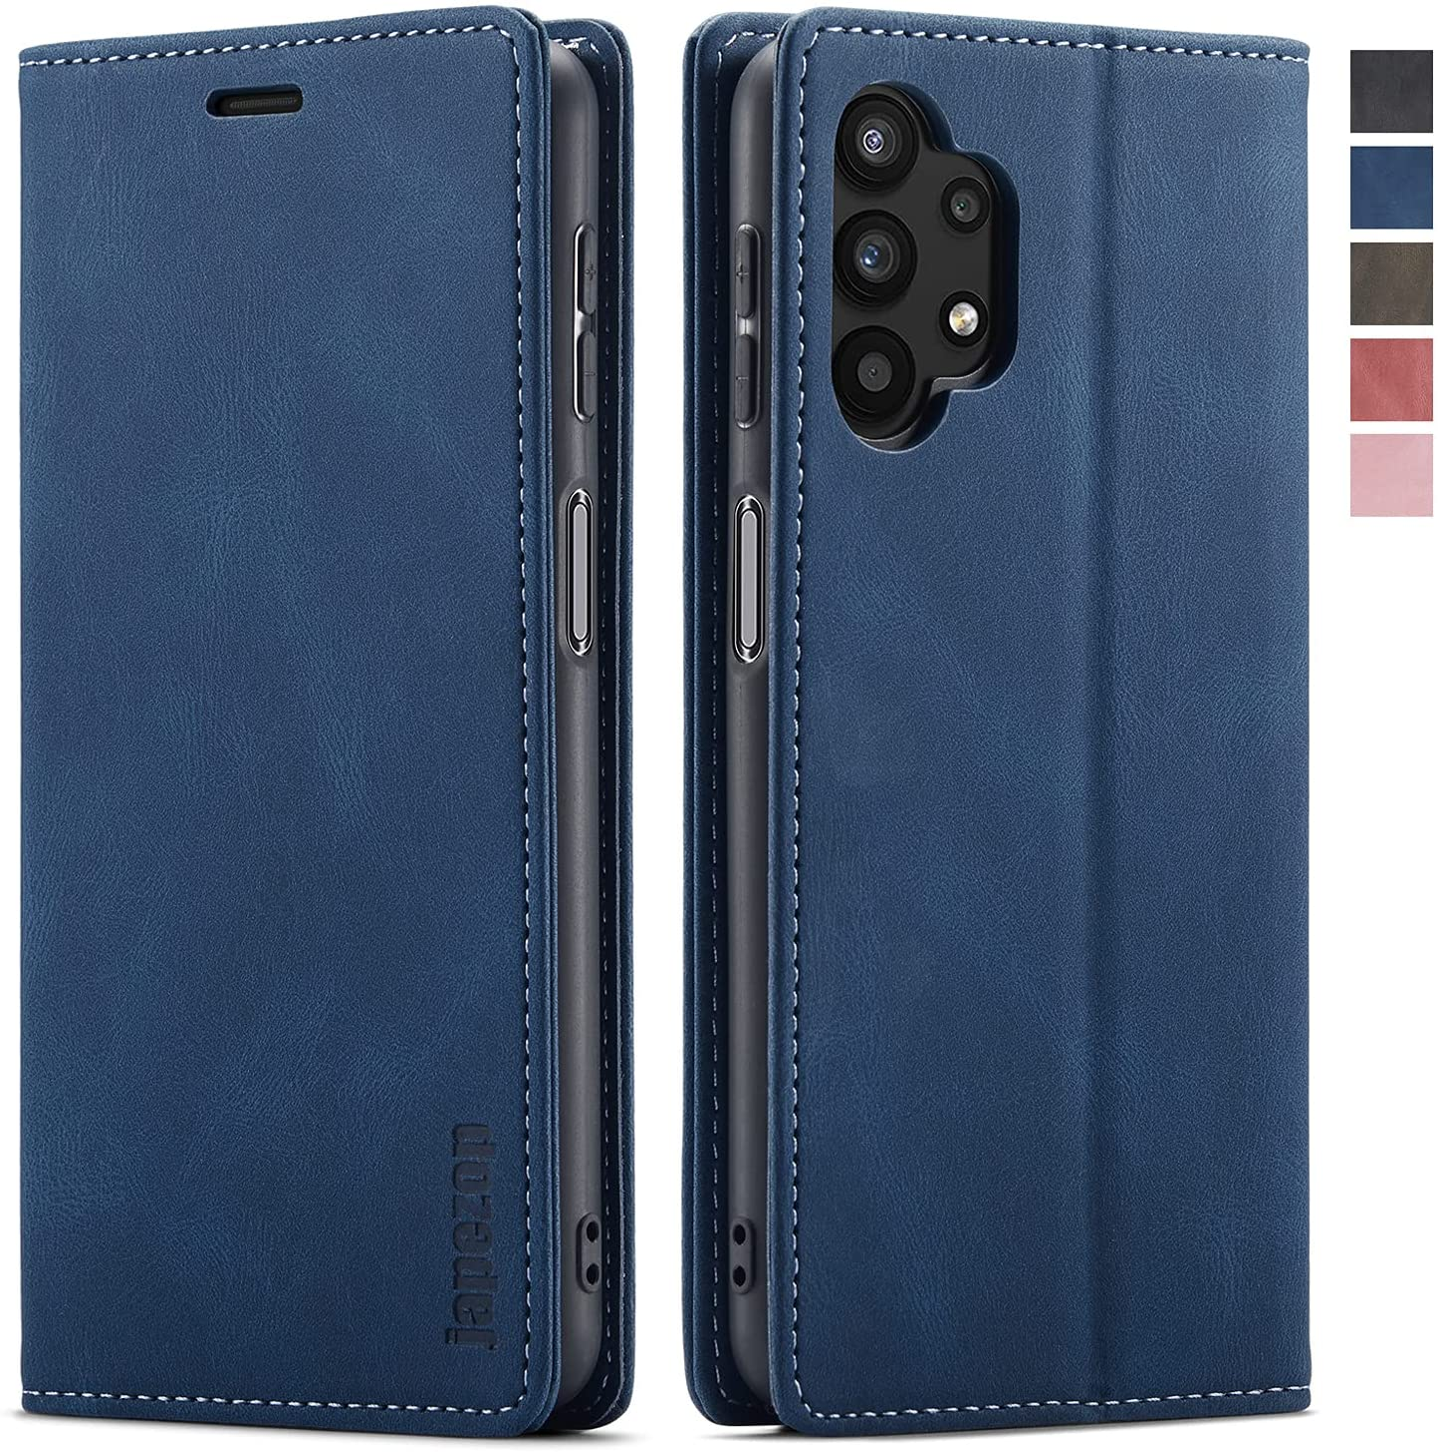 Samsung Galaxy A32 5G Case,Samsung Galaxy A32 5G Wallet Case with [RFID Blocking] Card Holder Kickstand Magnetic,Leather Flip Case for Samsung Galaxy A32 5G (Blue)